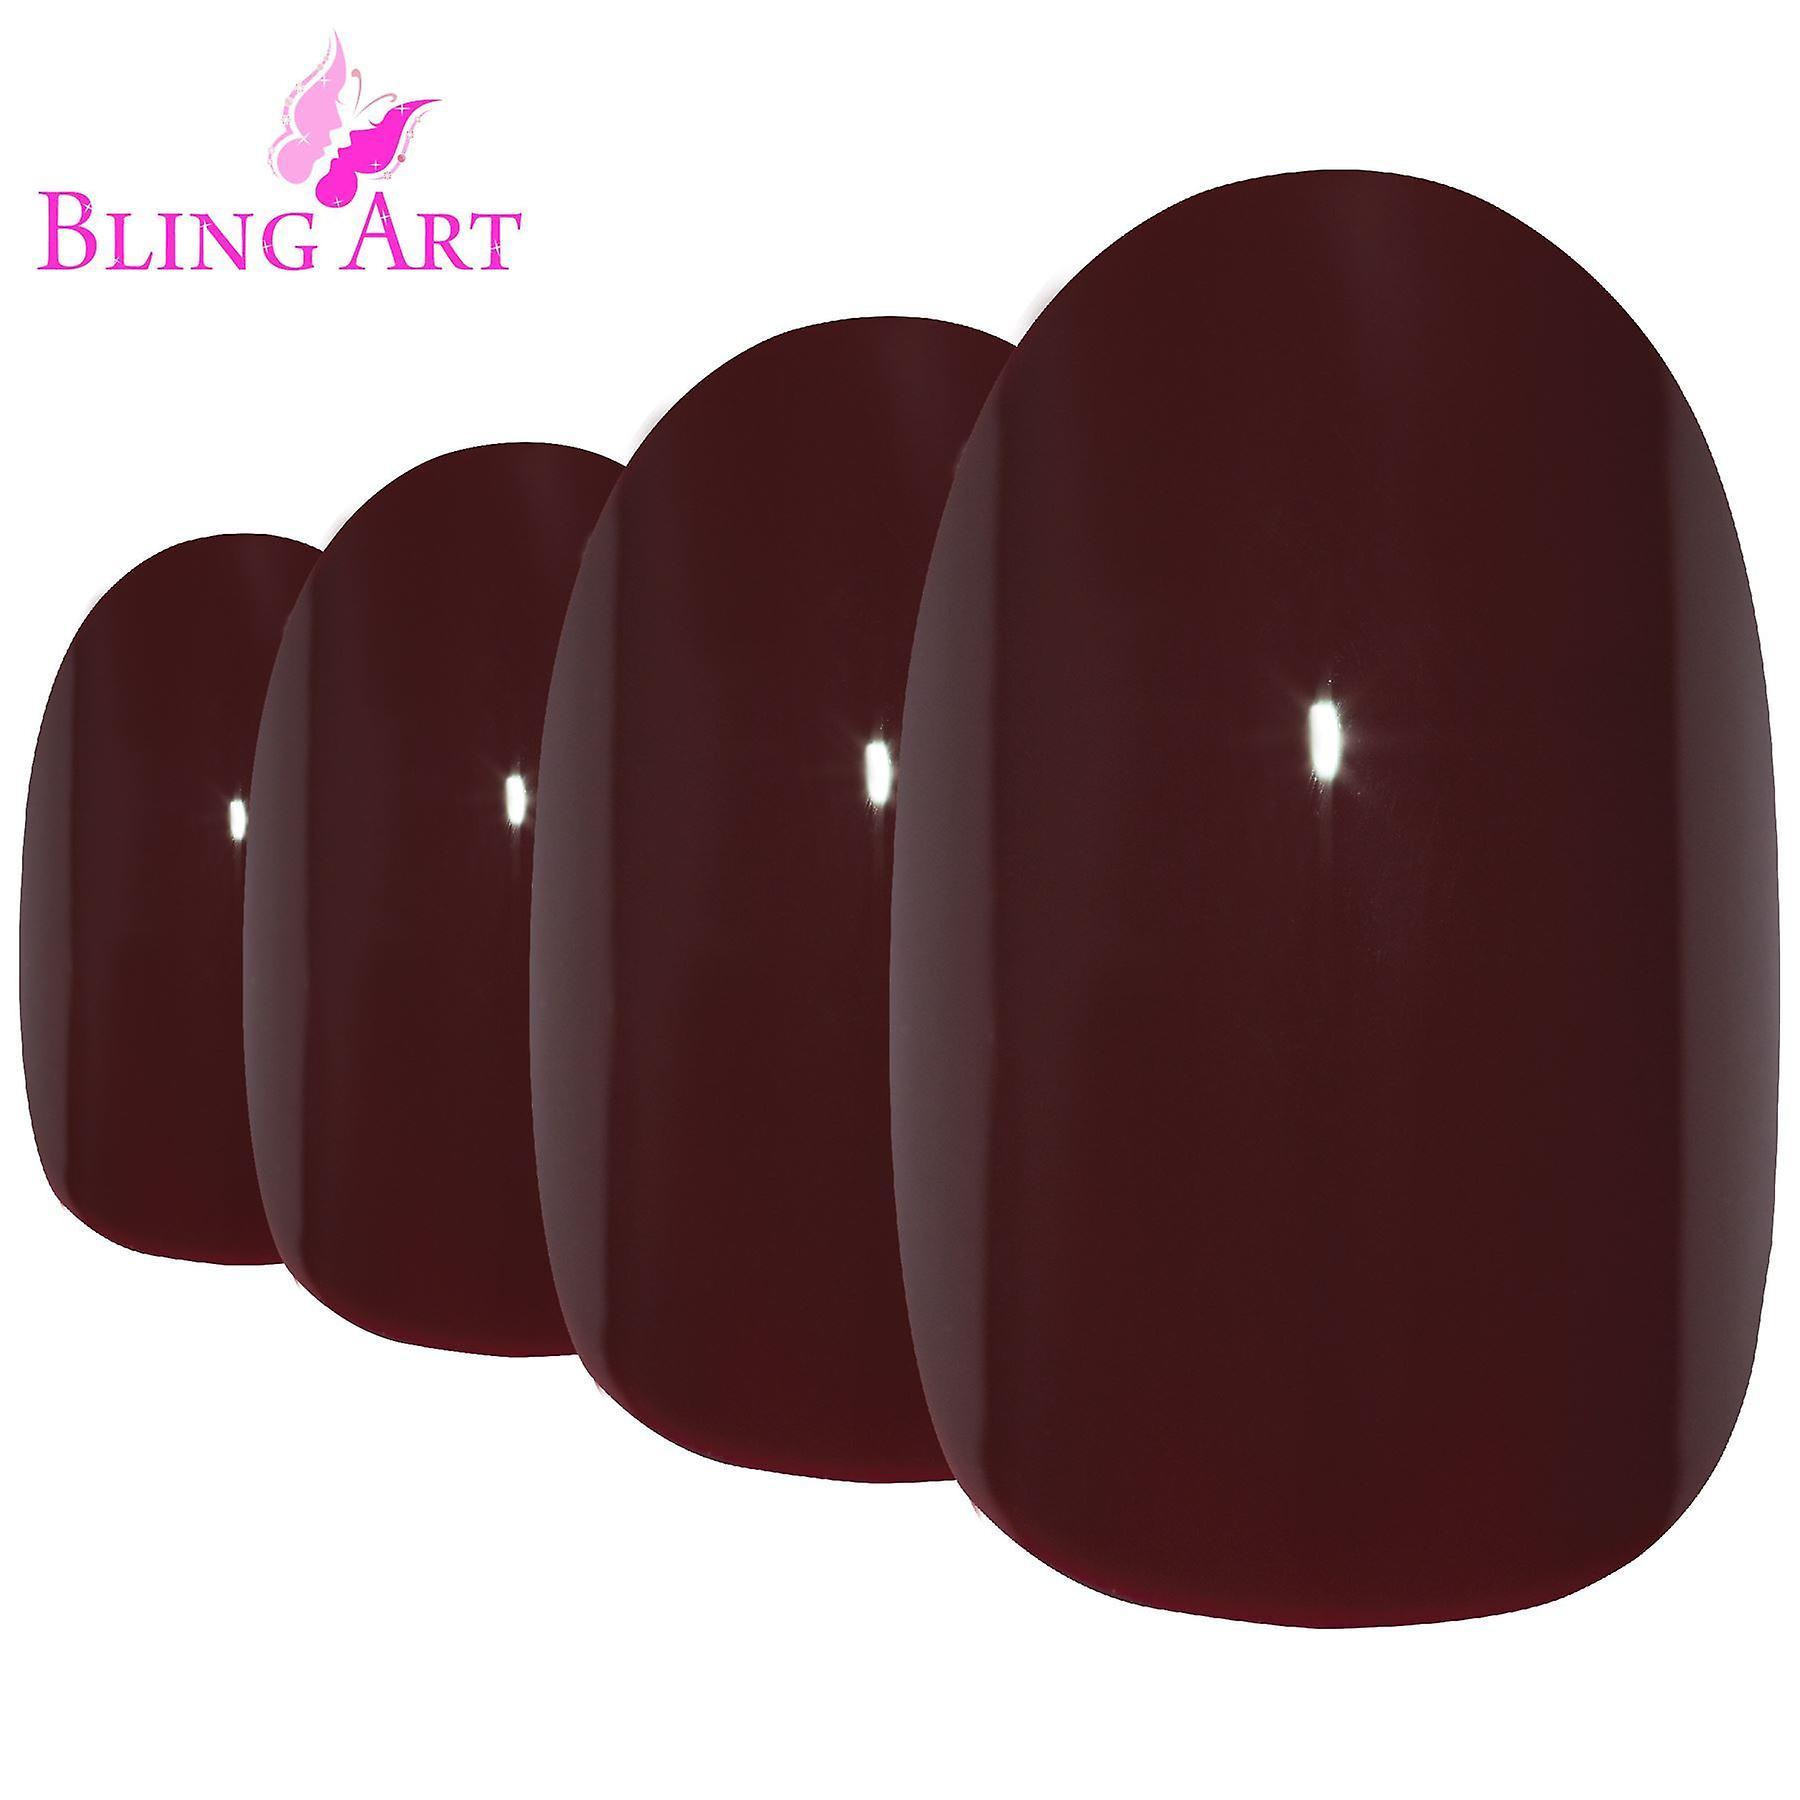 False nails by bling art red brown polished oval medium fake acrylic nail tips